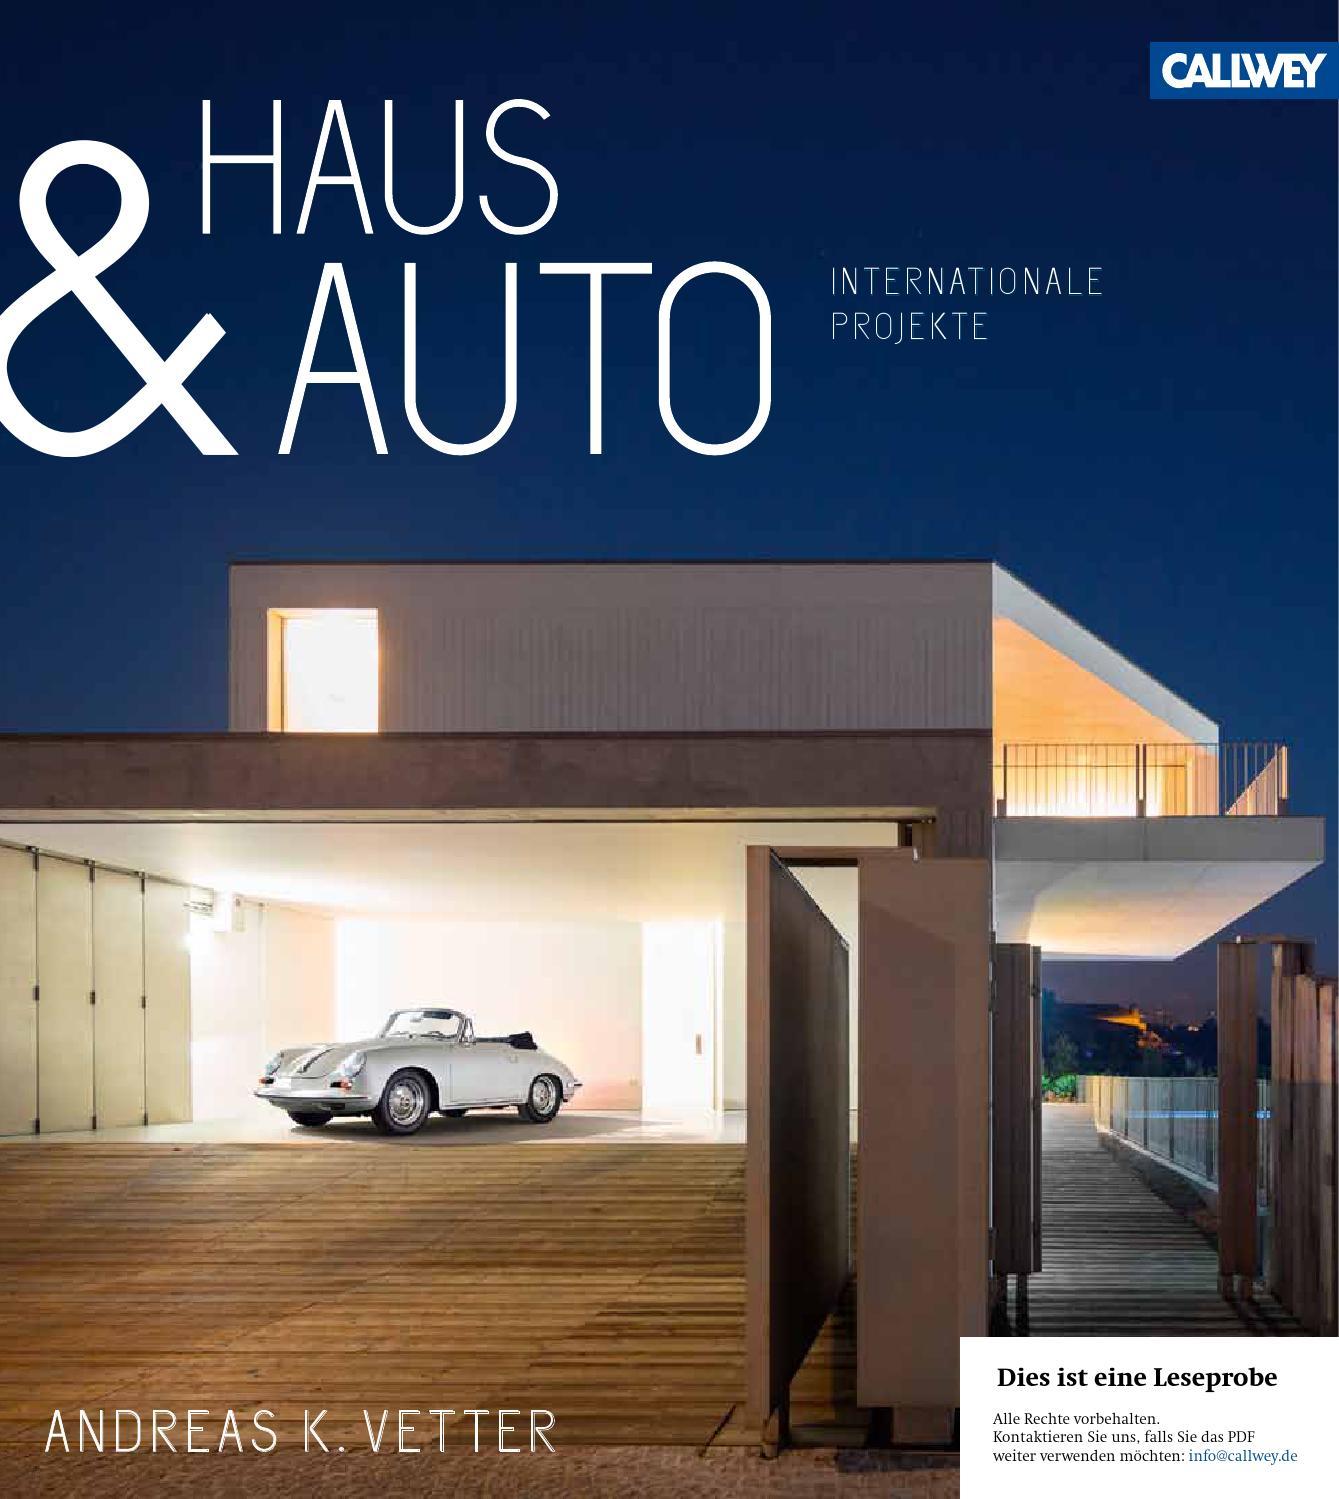 Haus Talblick: Vetter Haus Und Auto Internationale Projekte Callwey Issuu